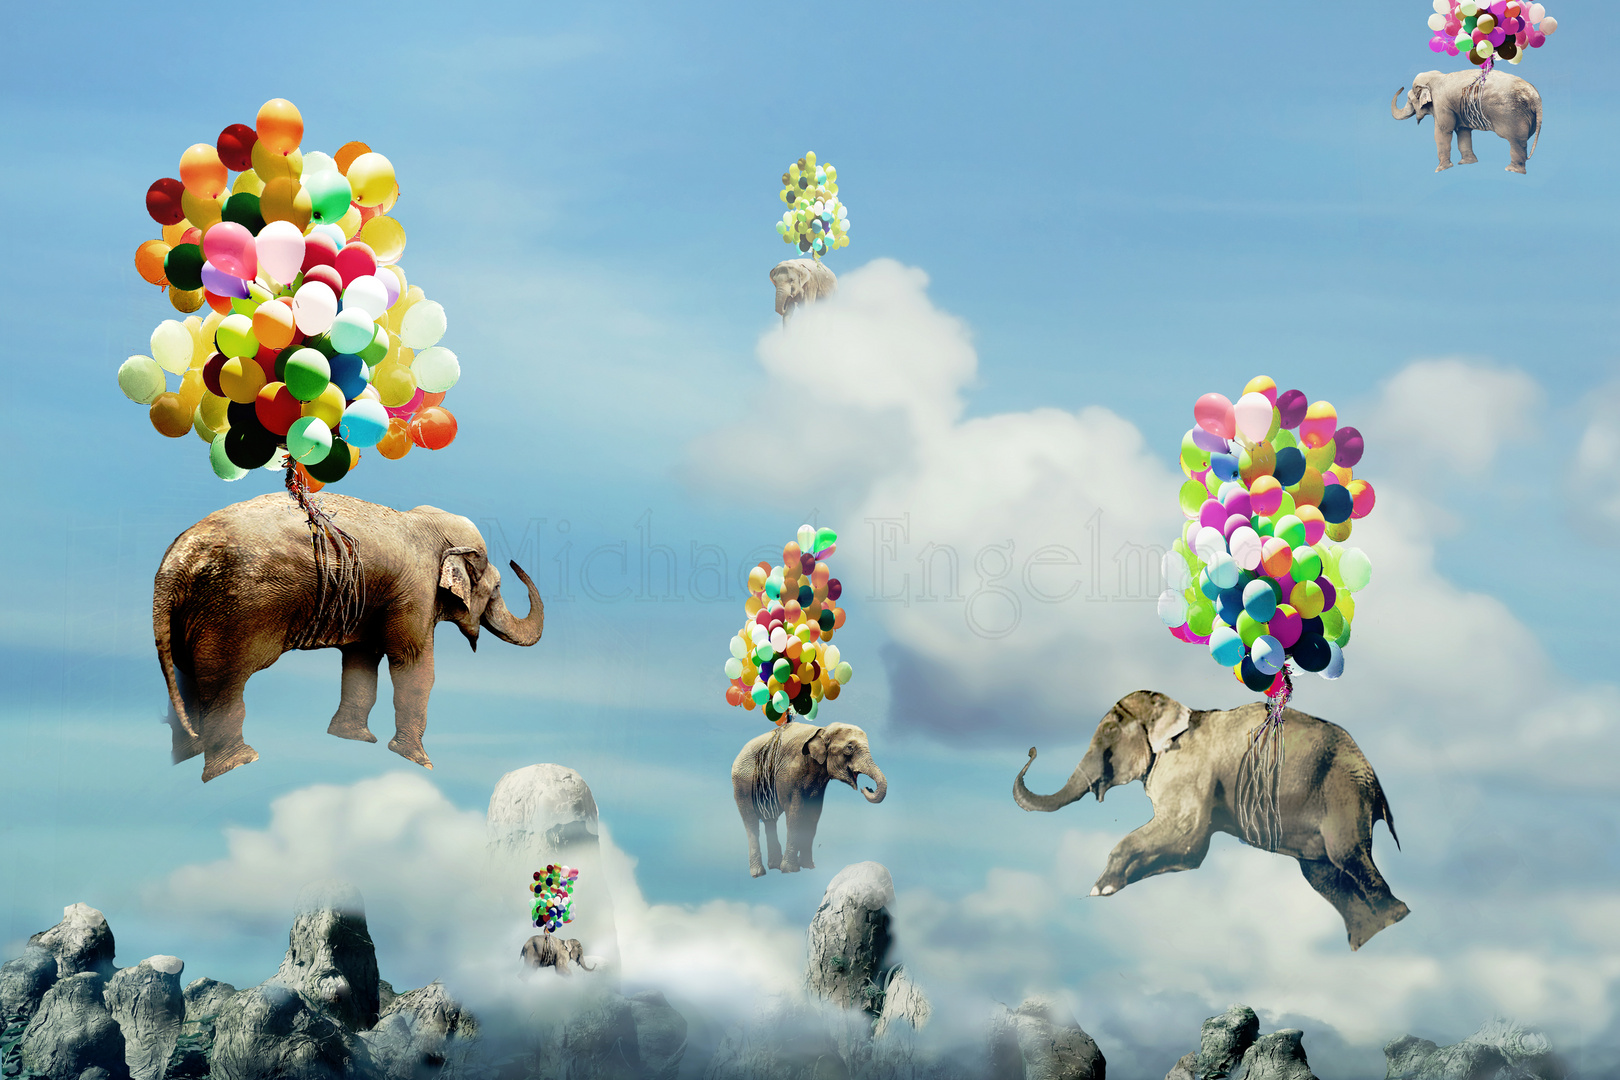 fliegende elefanten foto bild fotomontage fantasy mystery digi art bilder auf fotocommunity. Black Bedroom Furniture Sets. Home Design Ideas